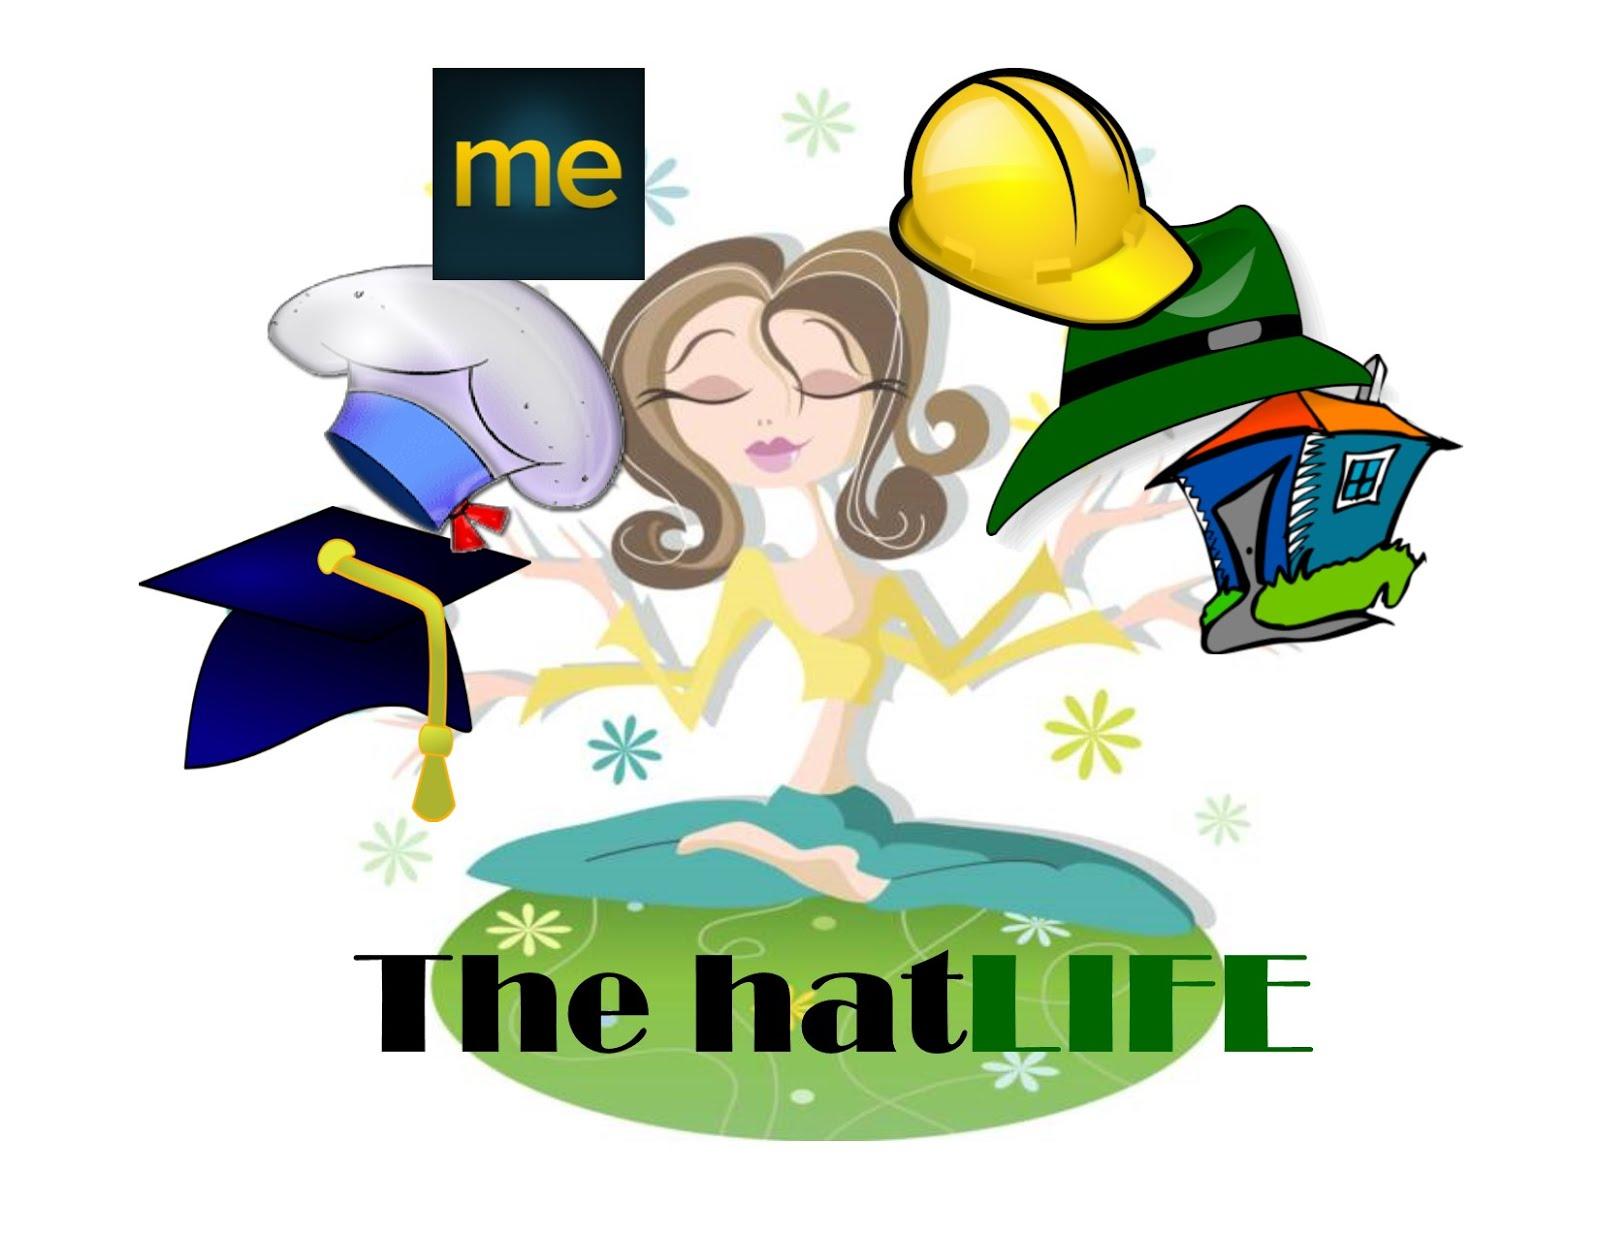 The hatLIFE